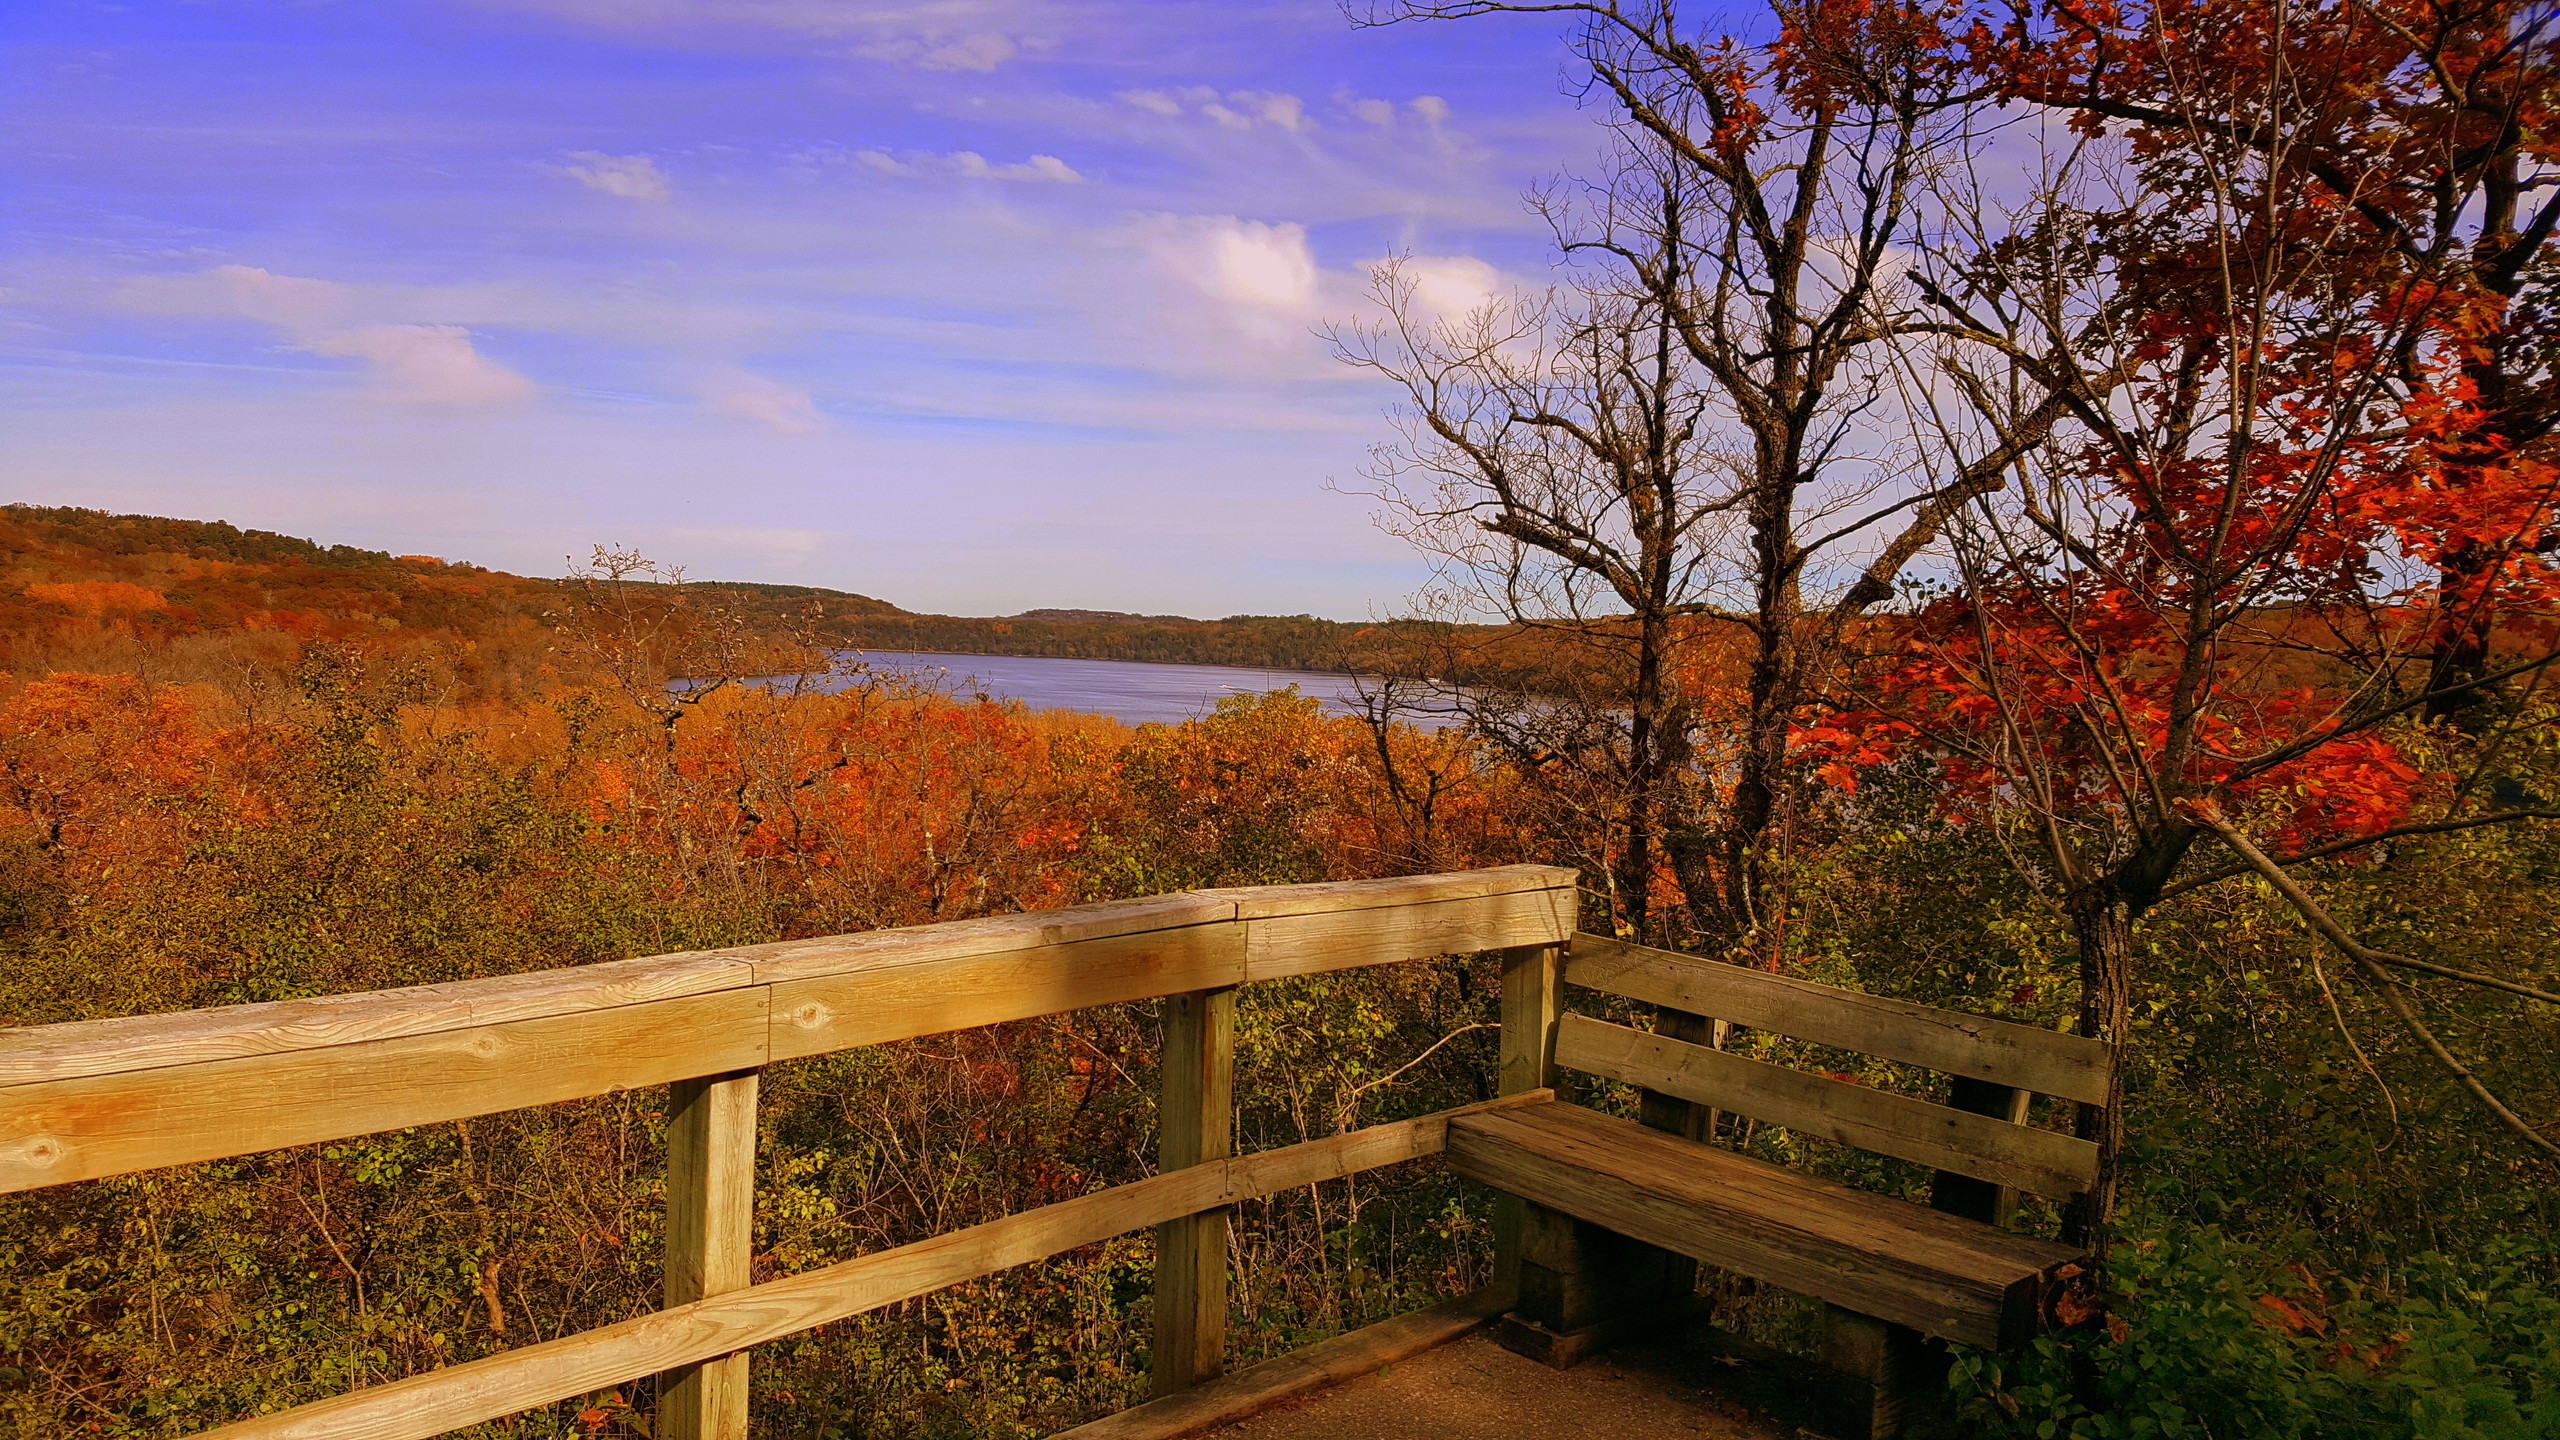 Scenic Overlook #1